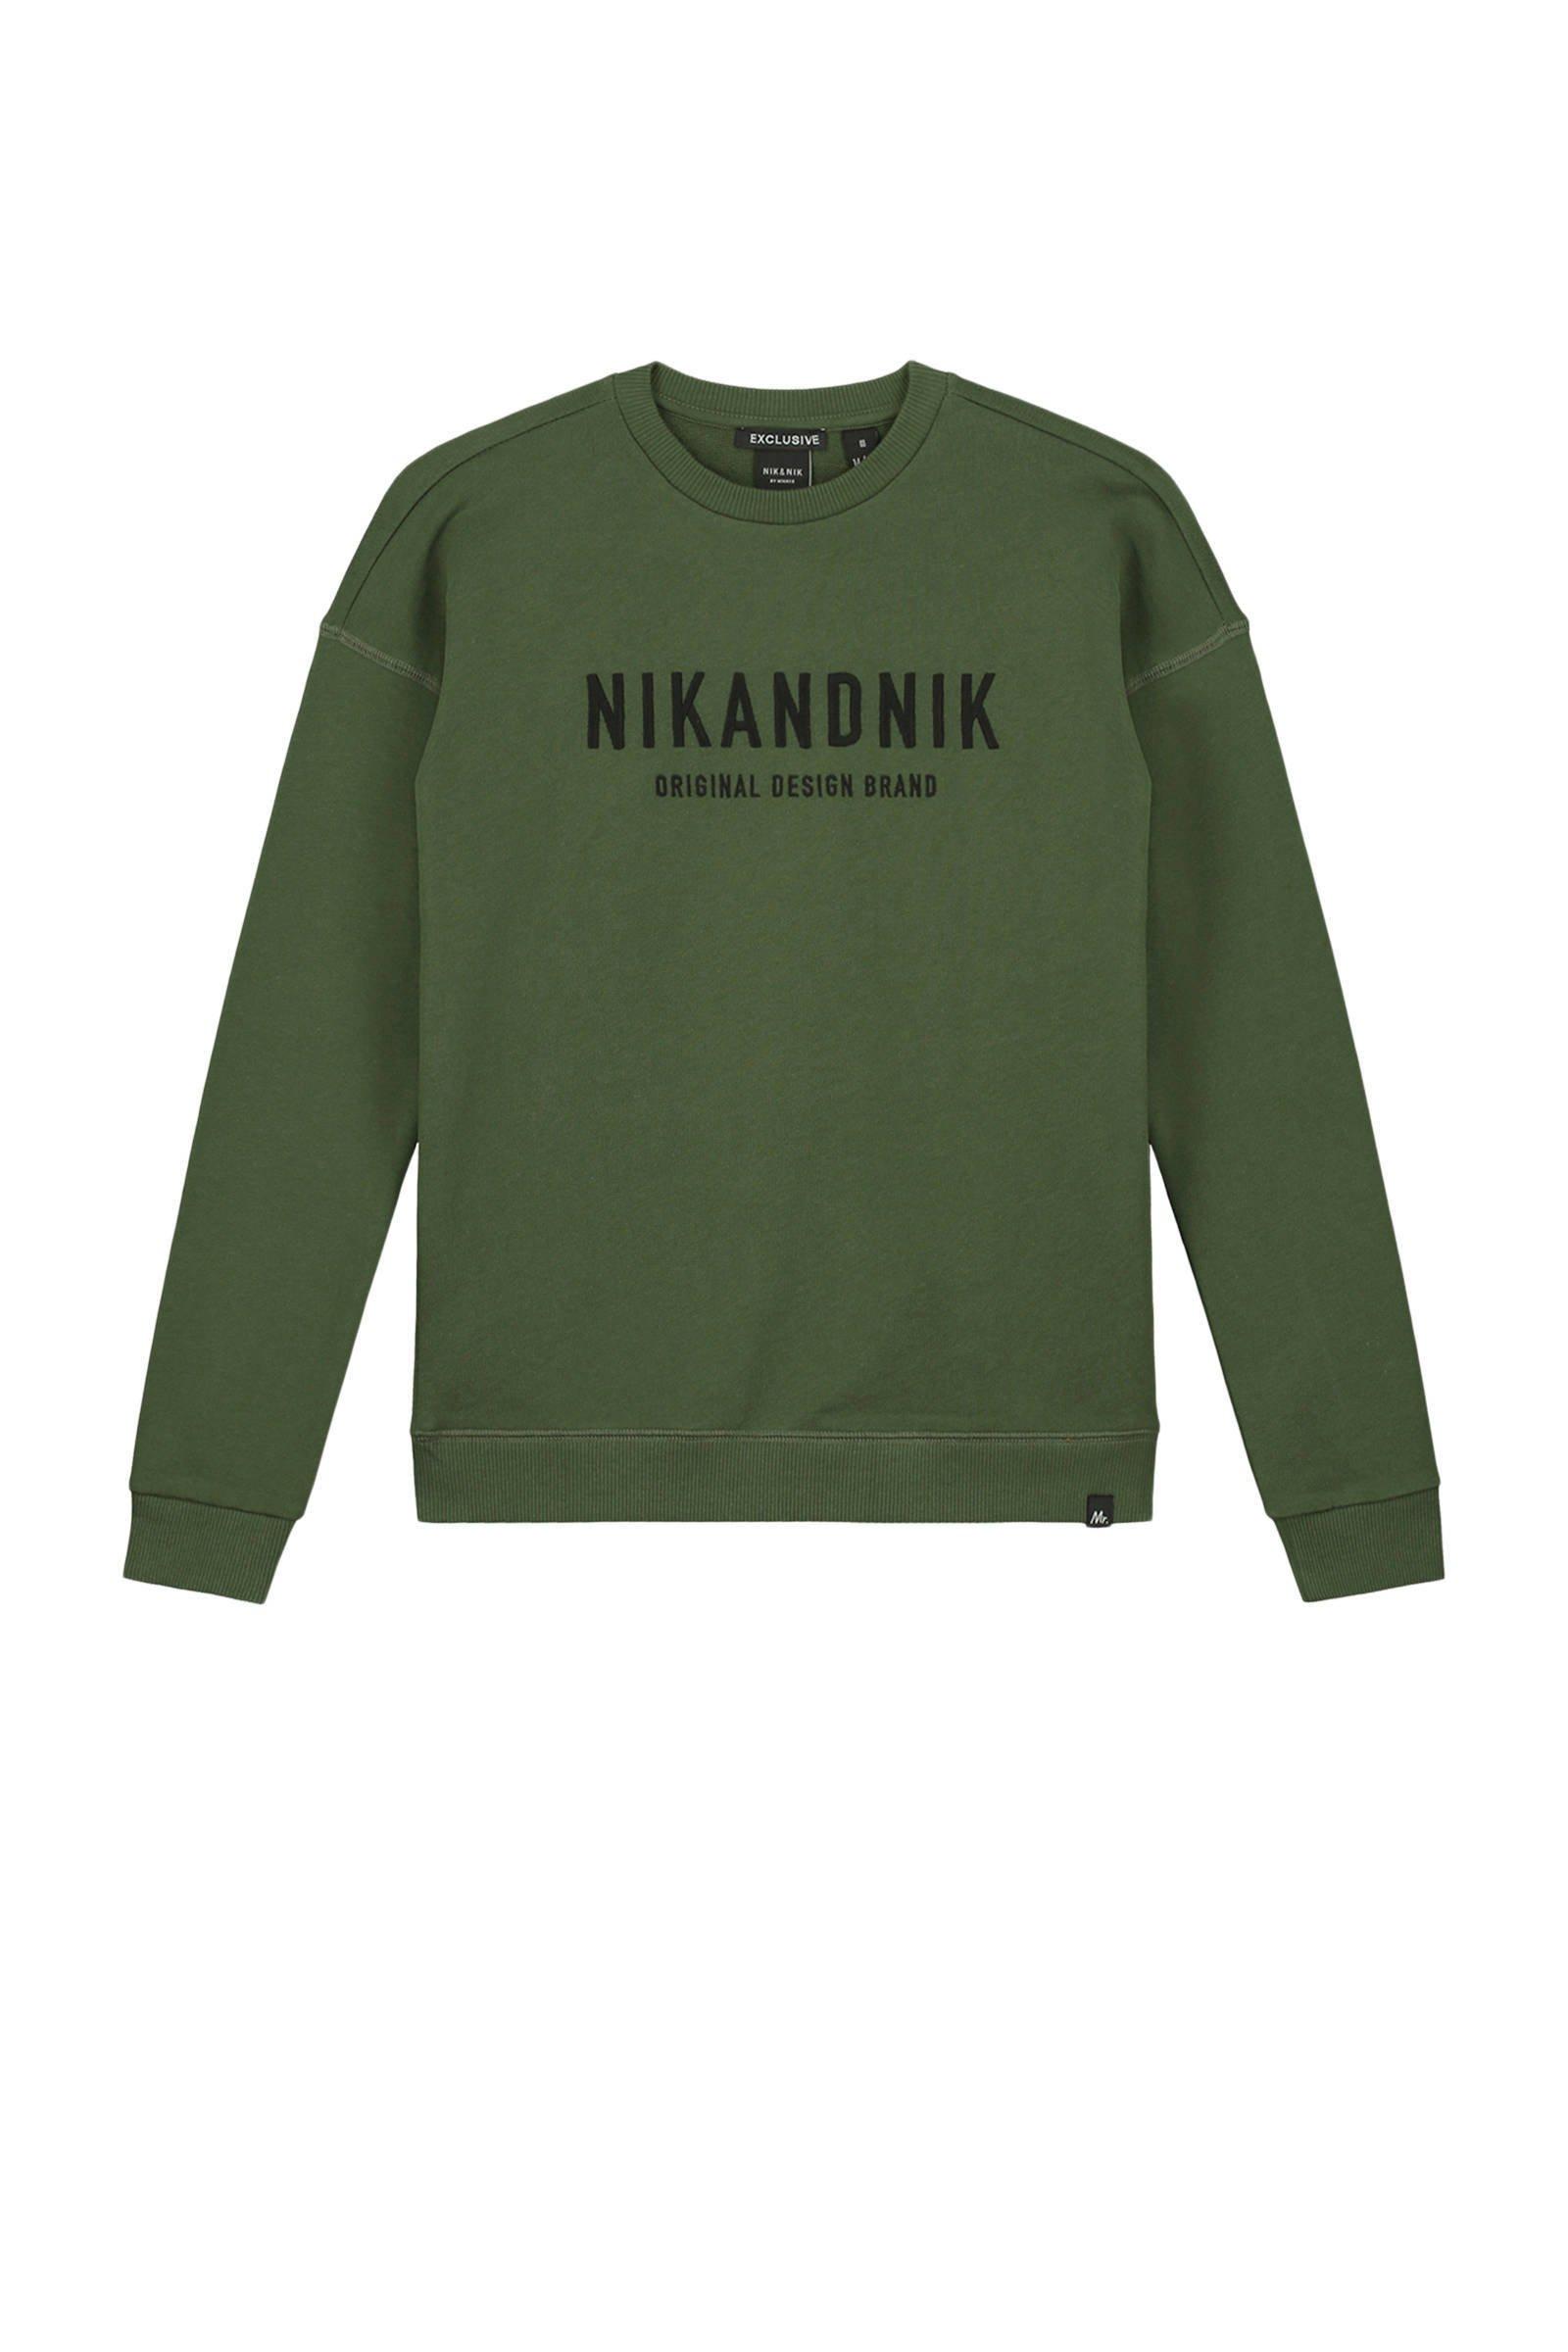 NIK&NIK sweater Milo met logo mosgroen - maat 140